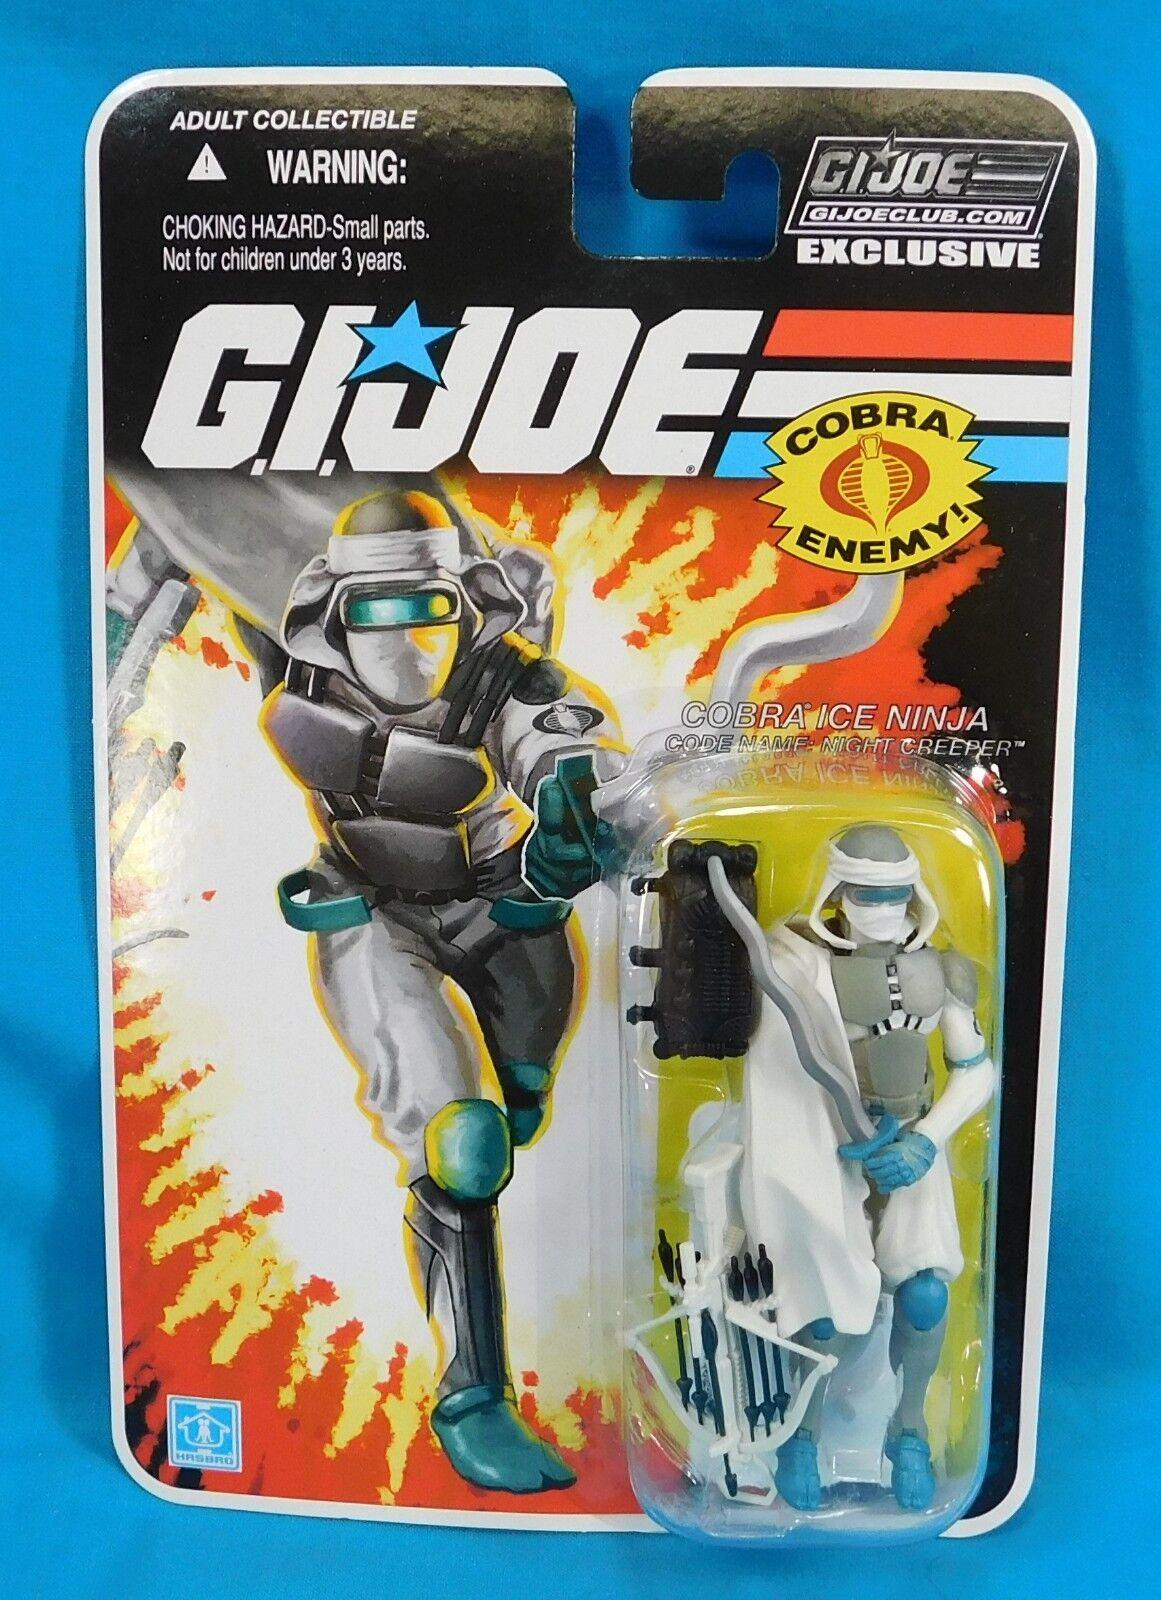 2015 Hasbro G.I Joe Club Exclusive Night Creeper New on Card